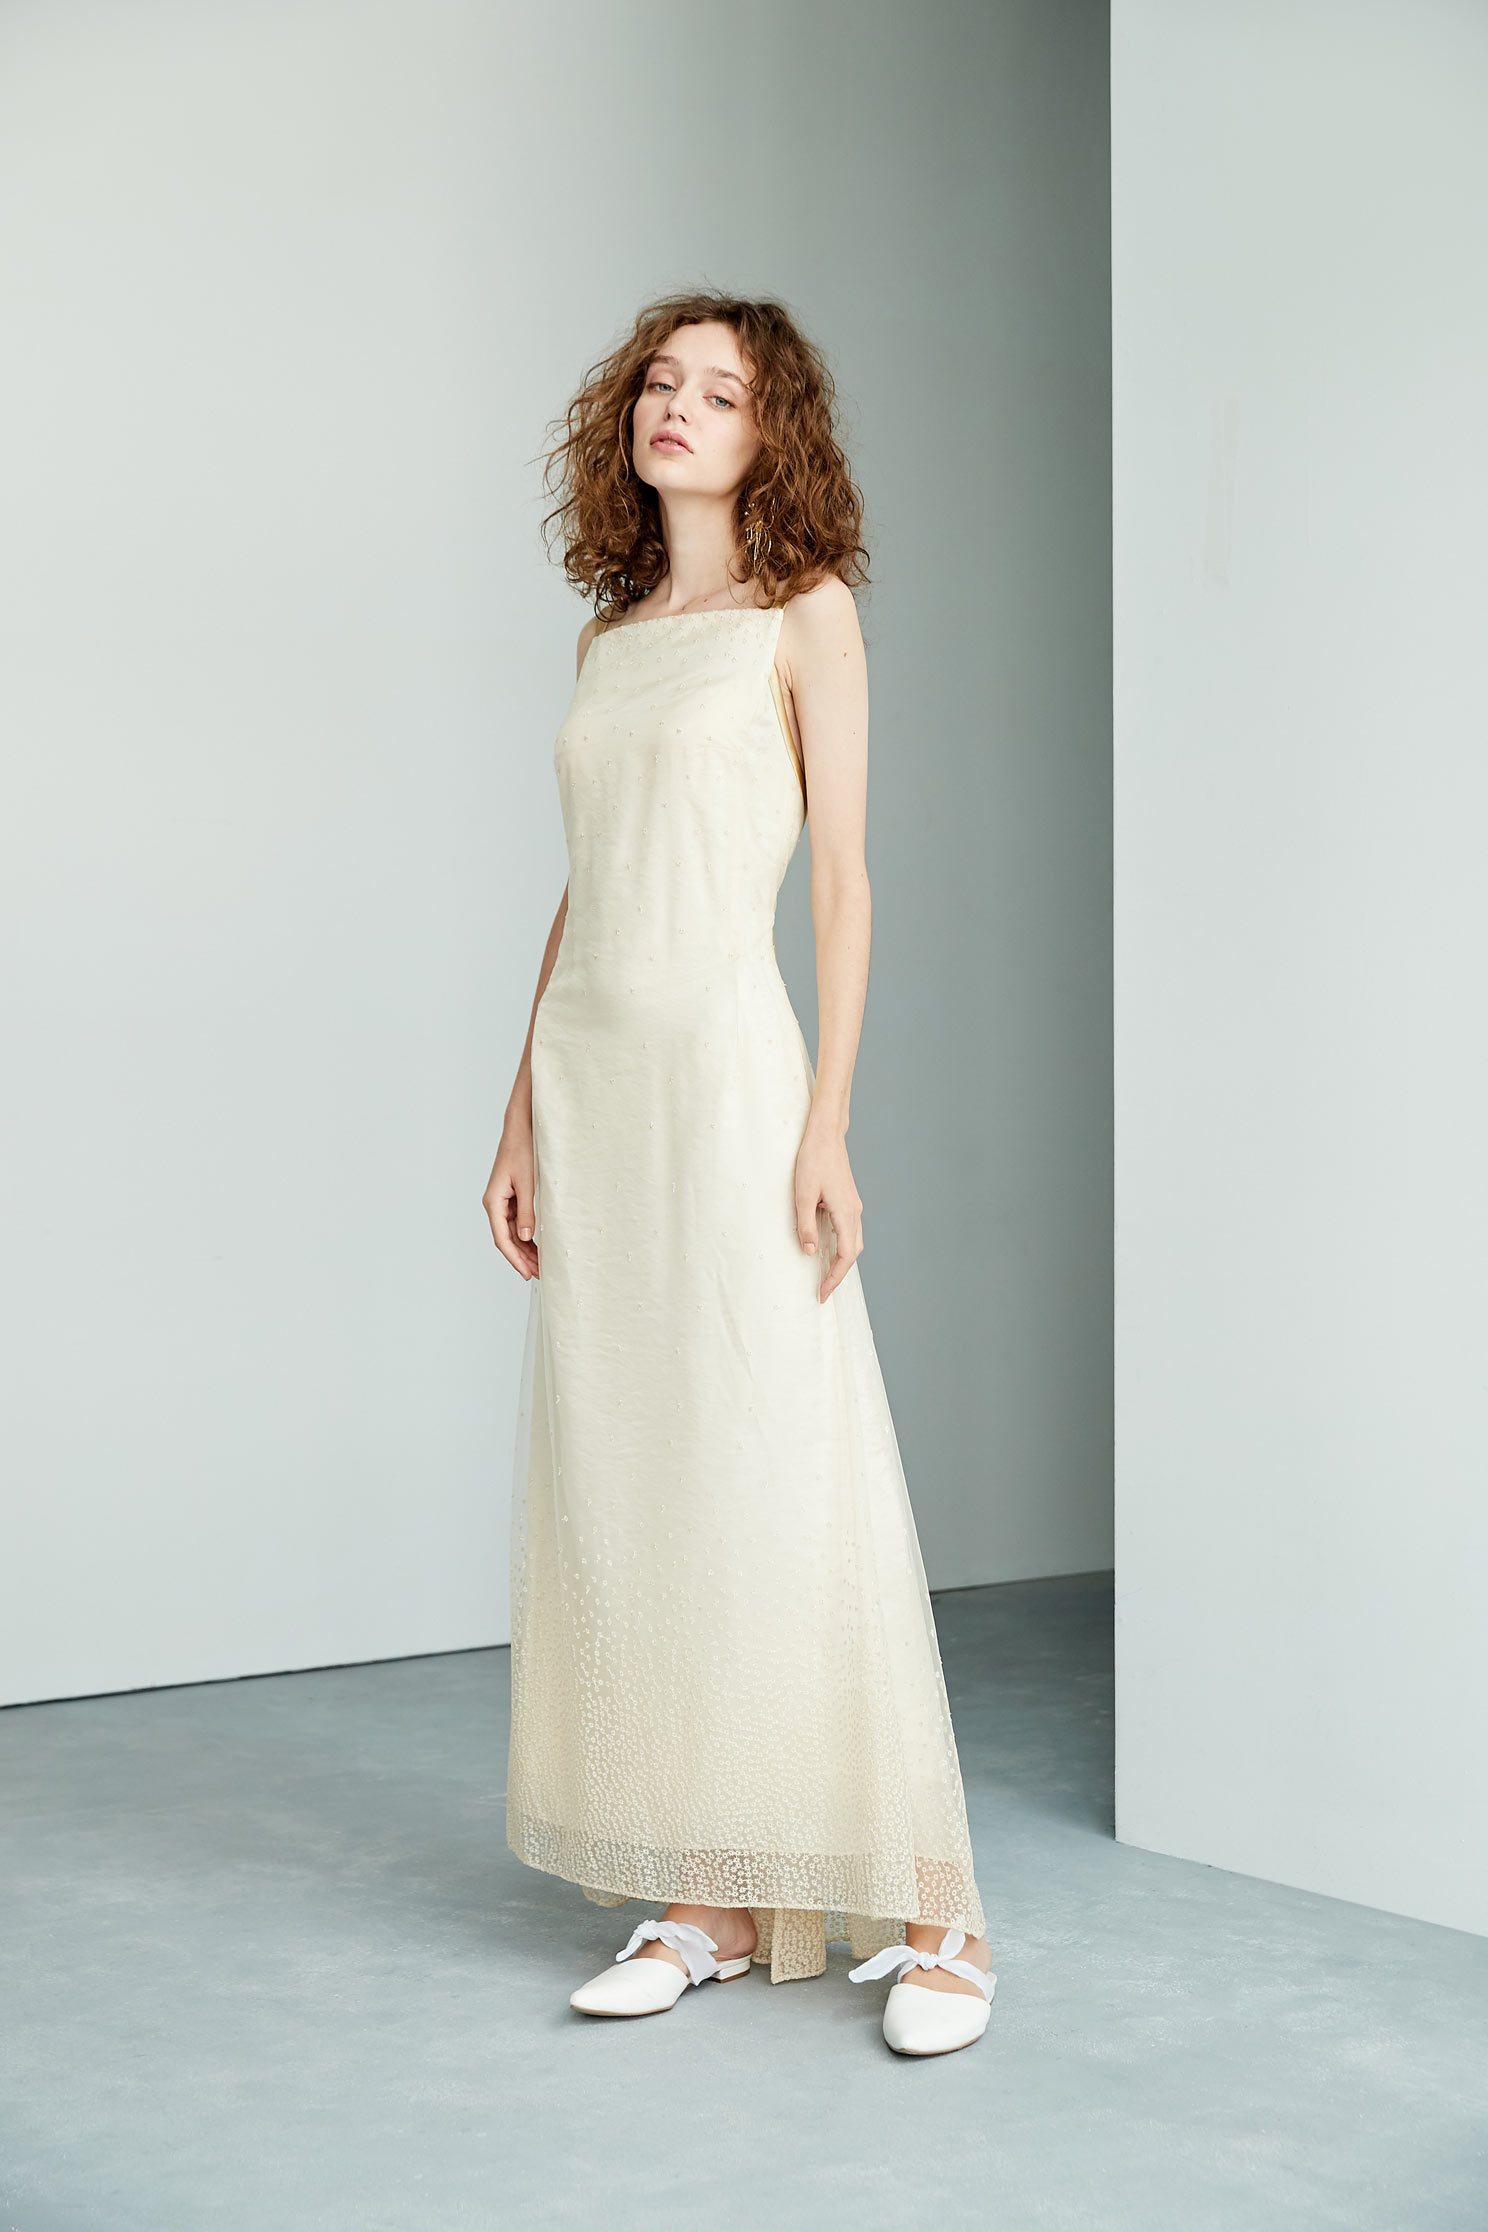 Elegant and gorgeous dress